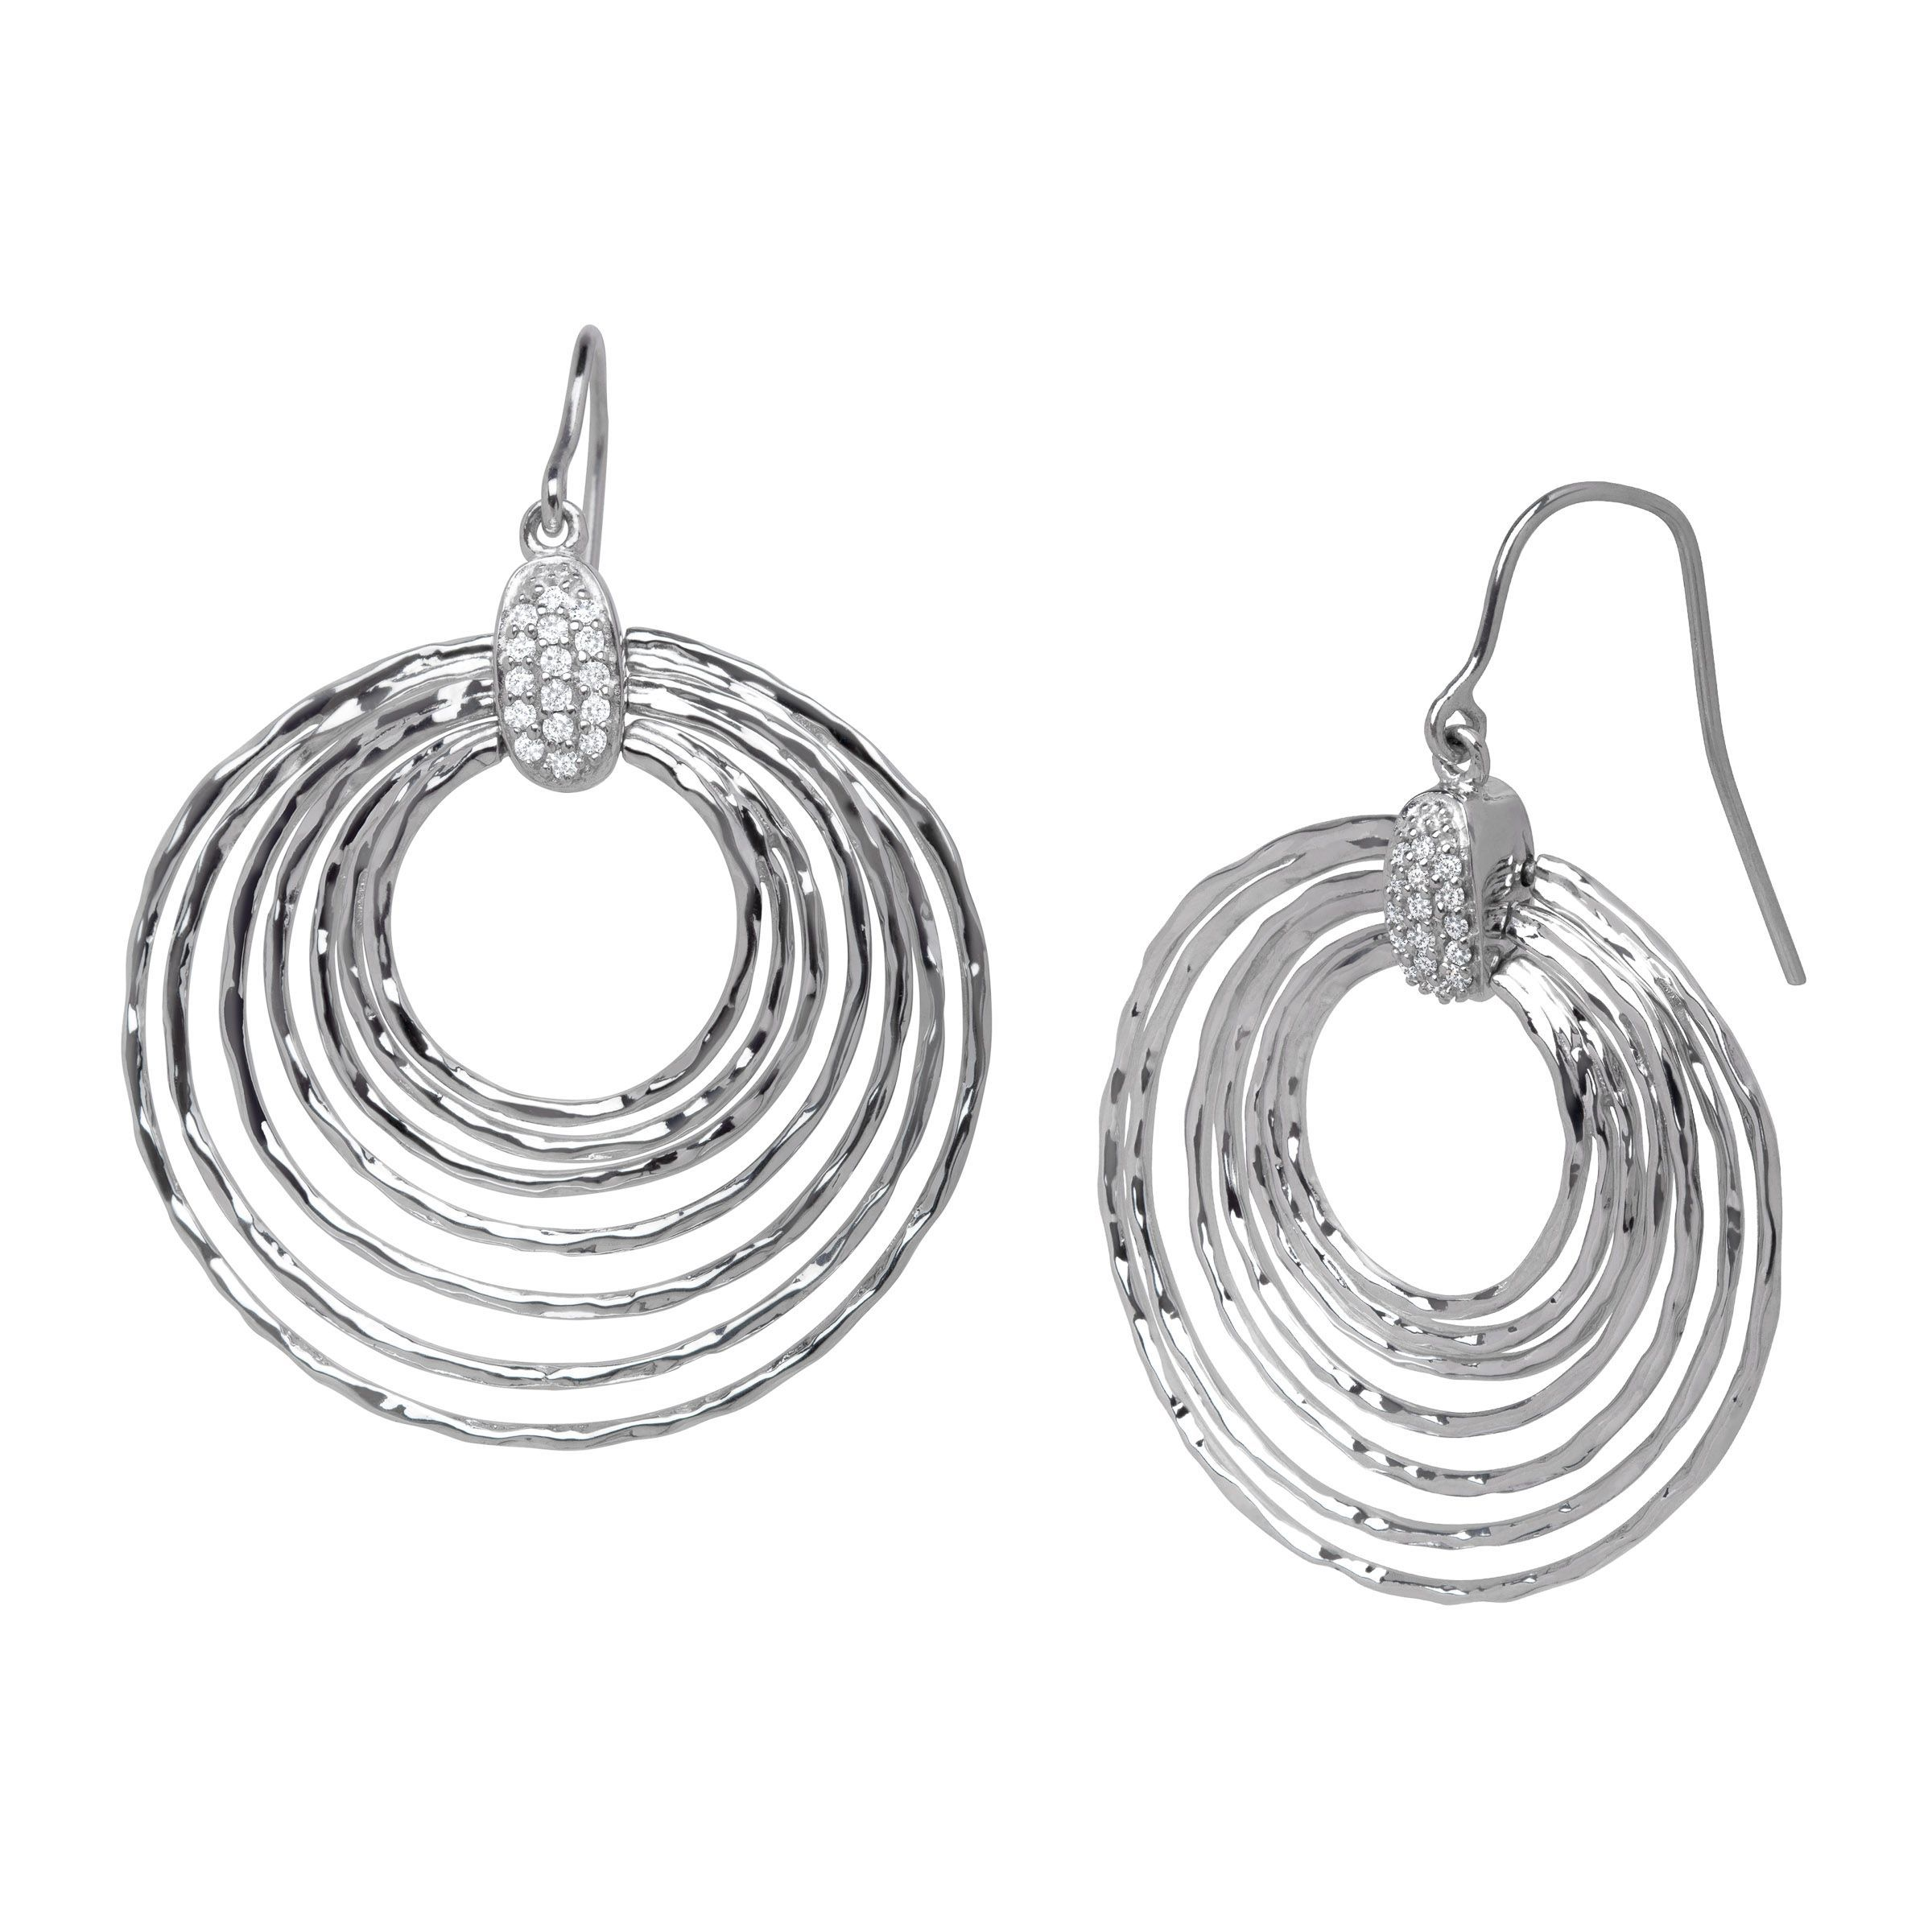 1 6 Ct Diamond Circle Drop Earrings In Sterling Silver